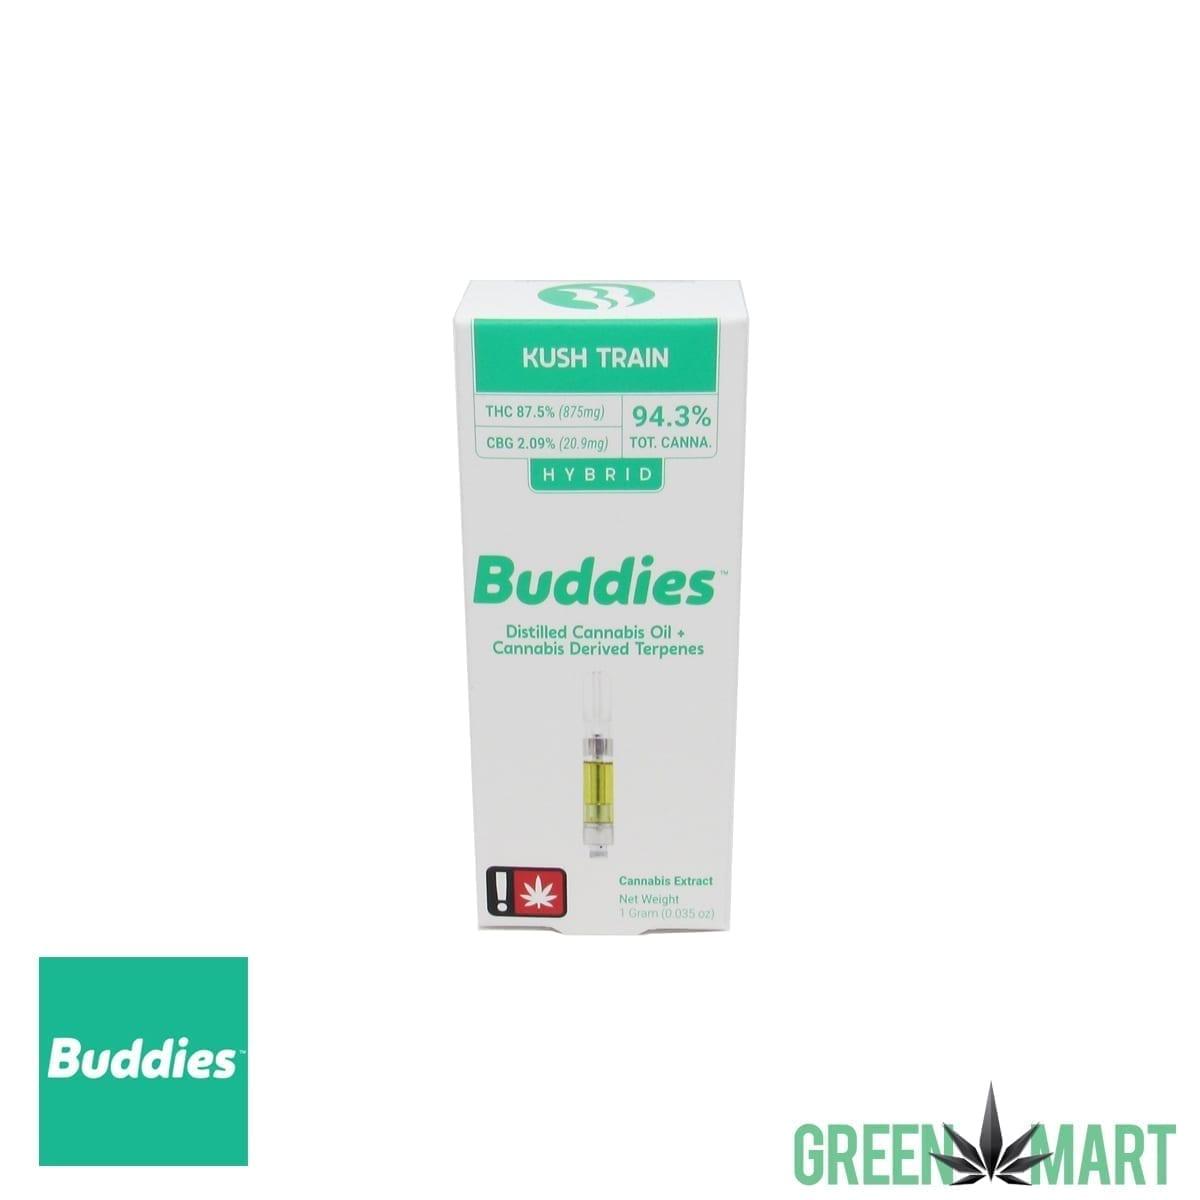 Buddies Brand Distillate Cartridge – Kush Train – Green Mart